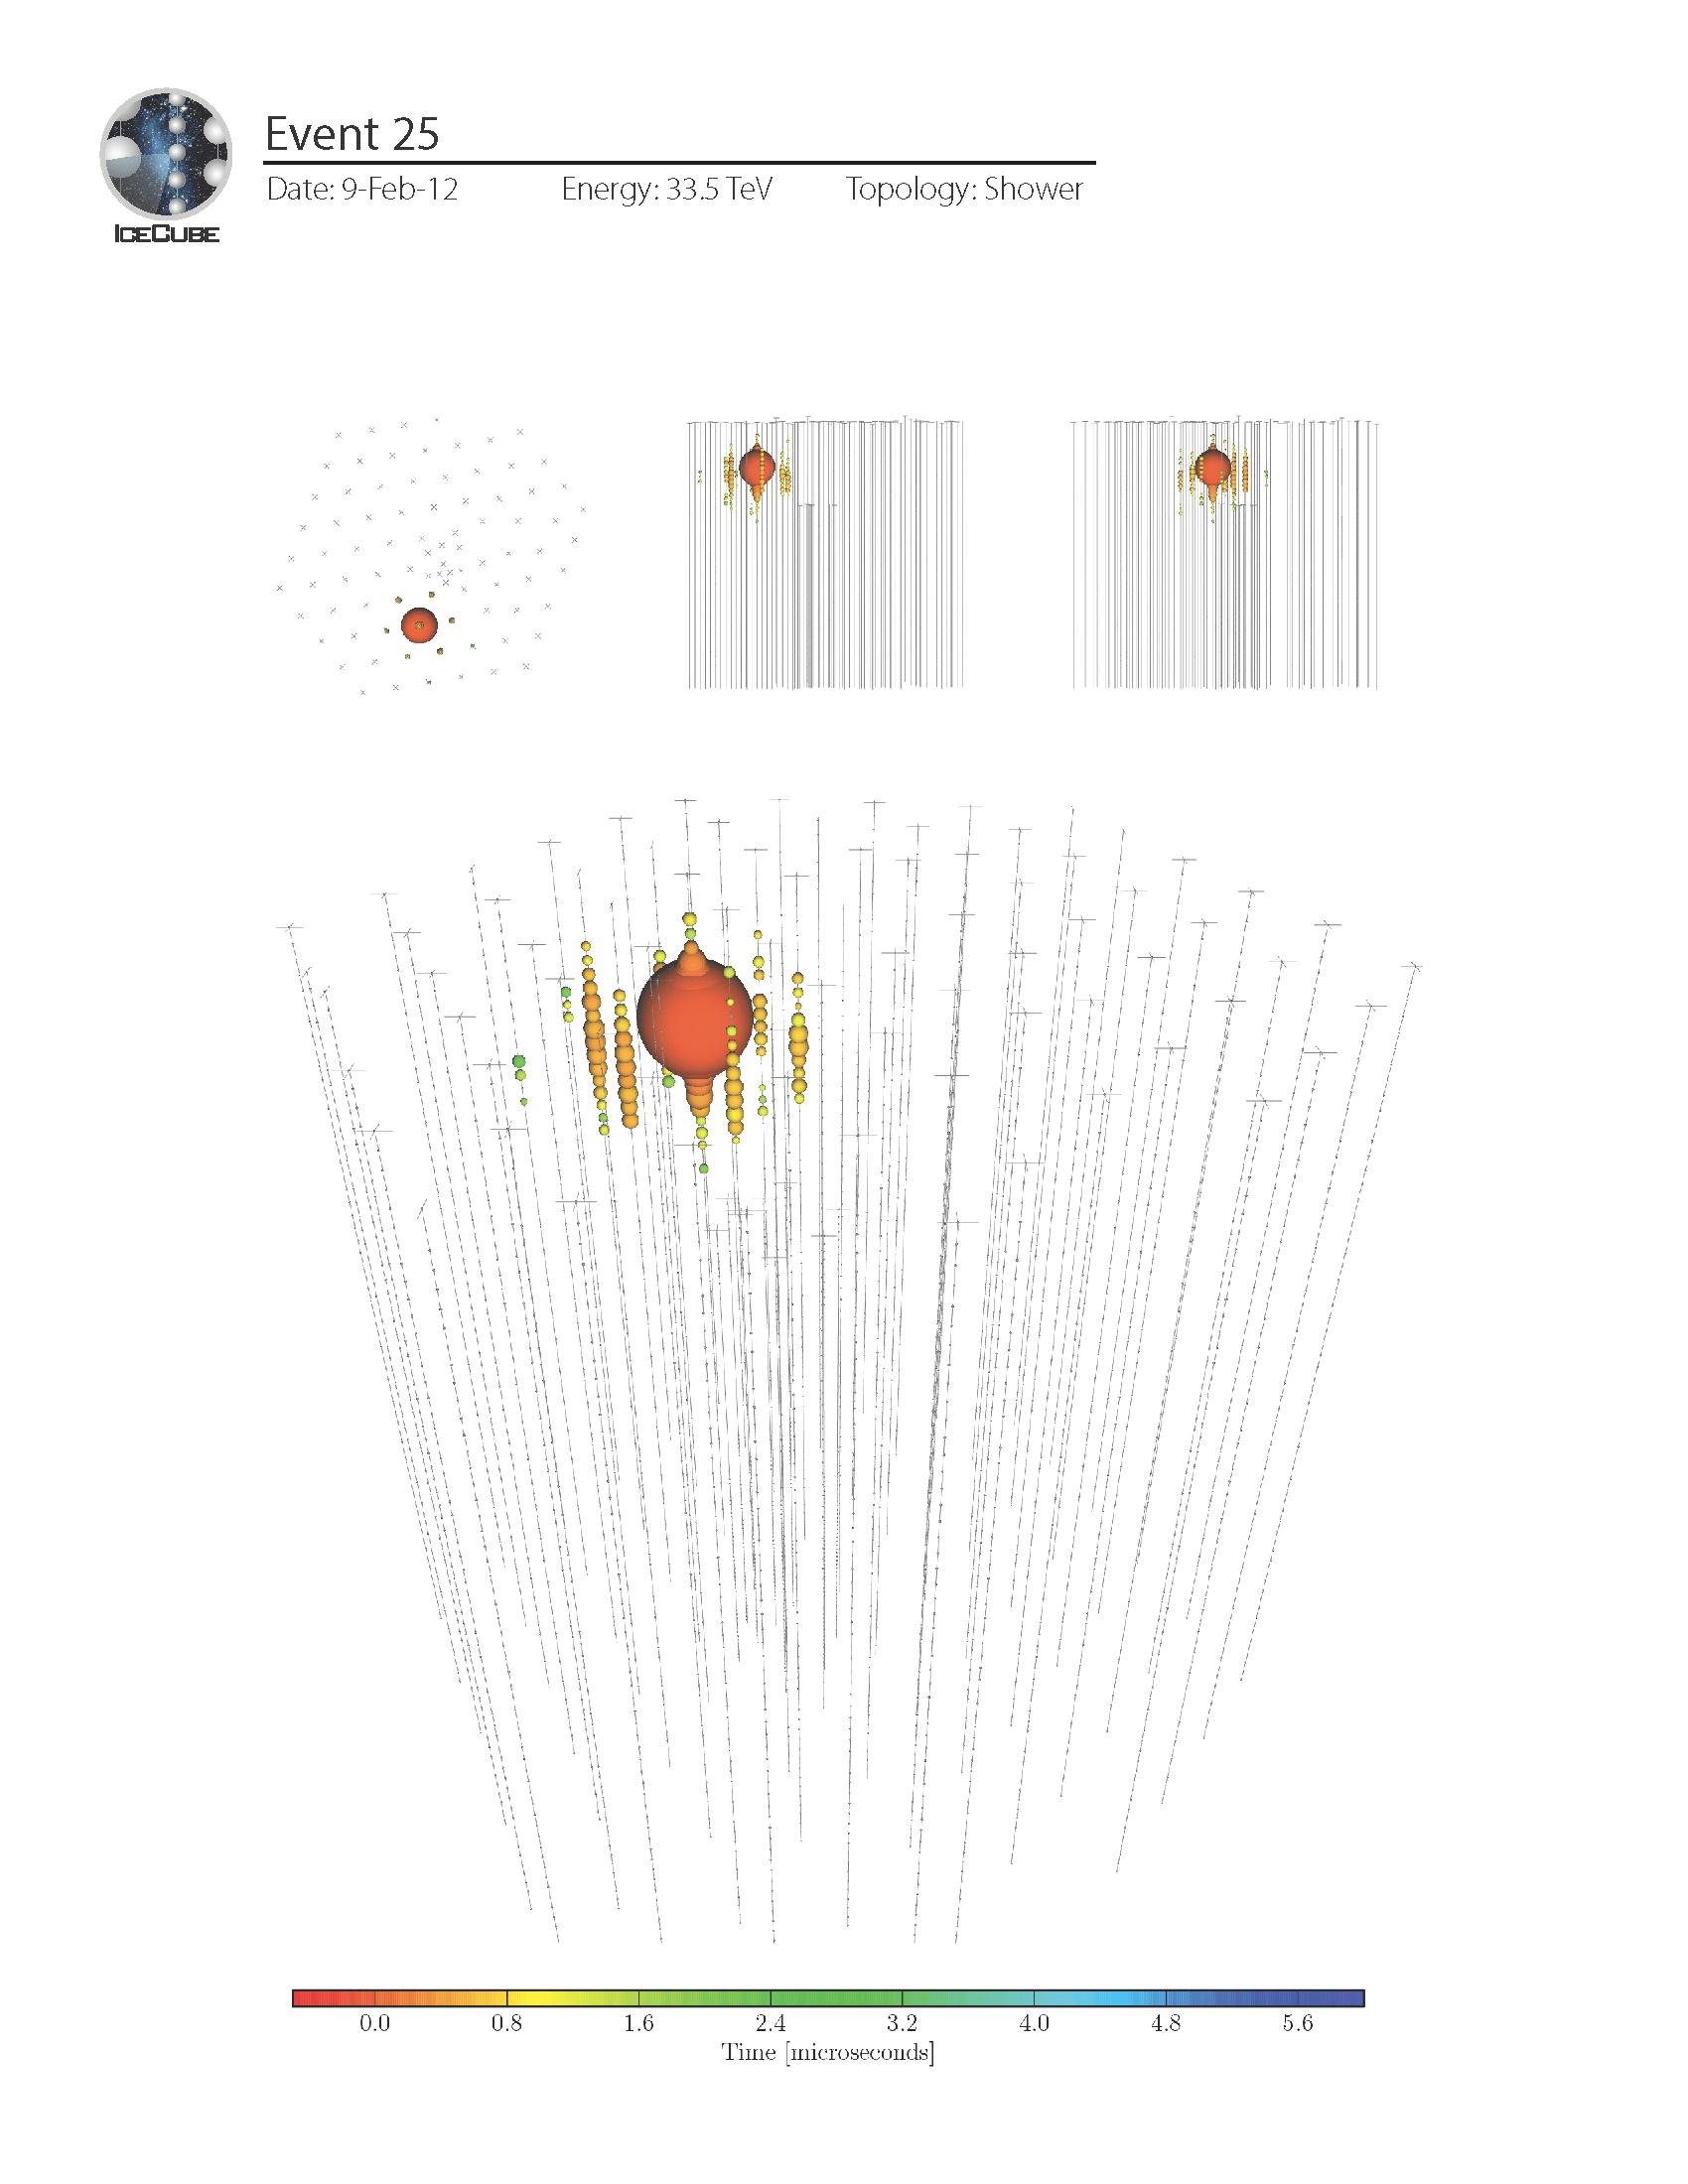 Event 25: 33.5 TeV, February 9, 2012